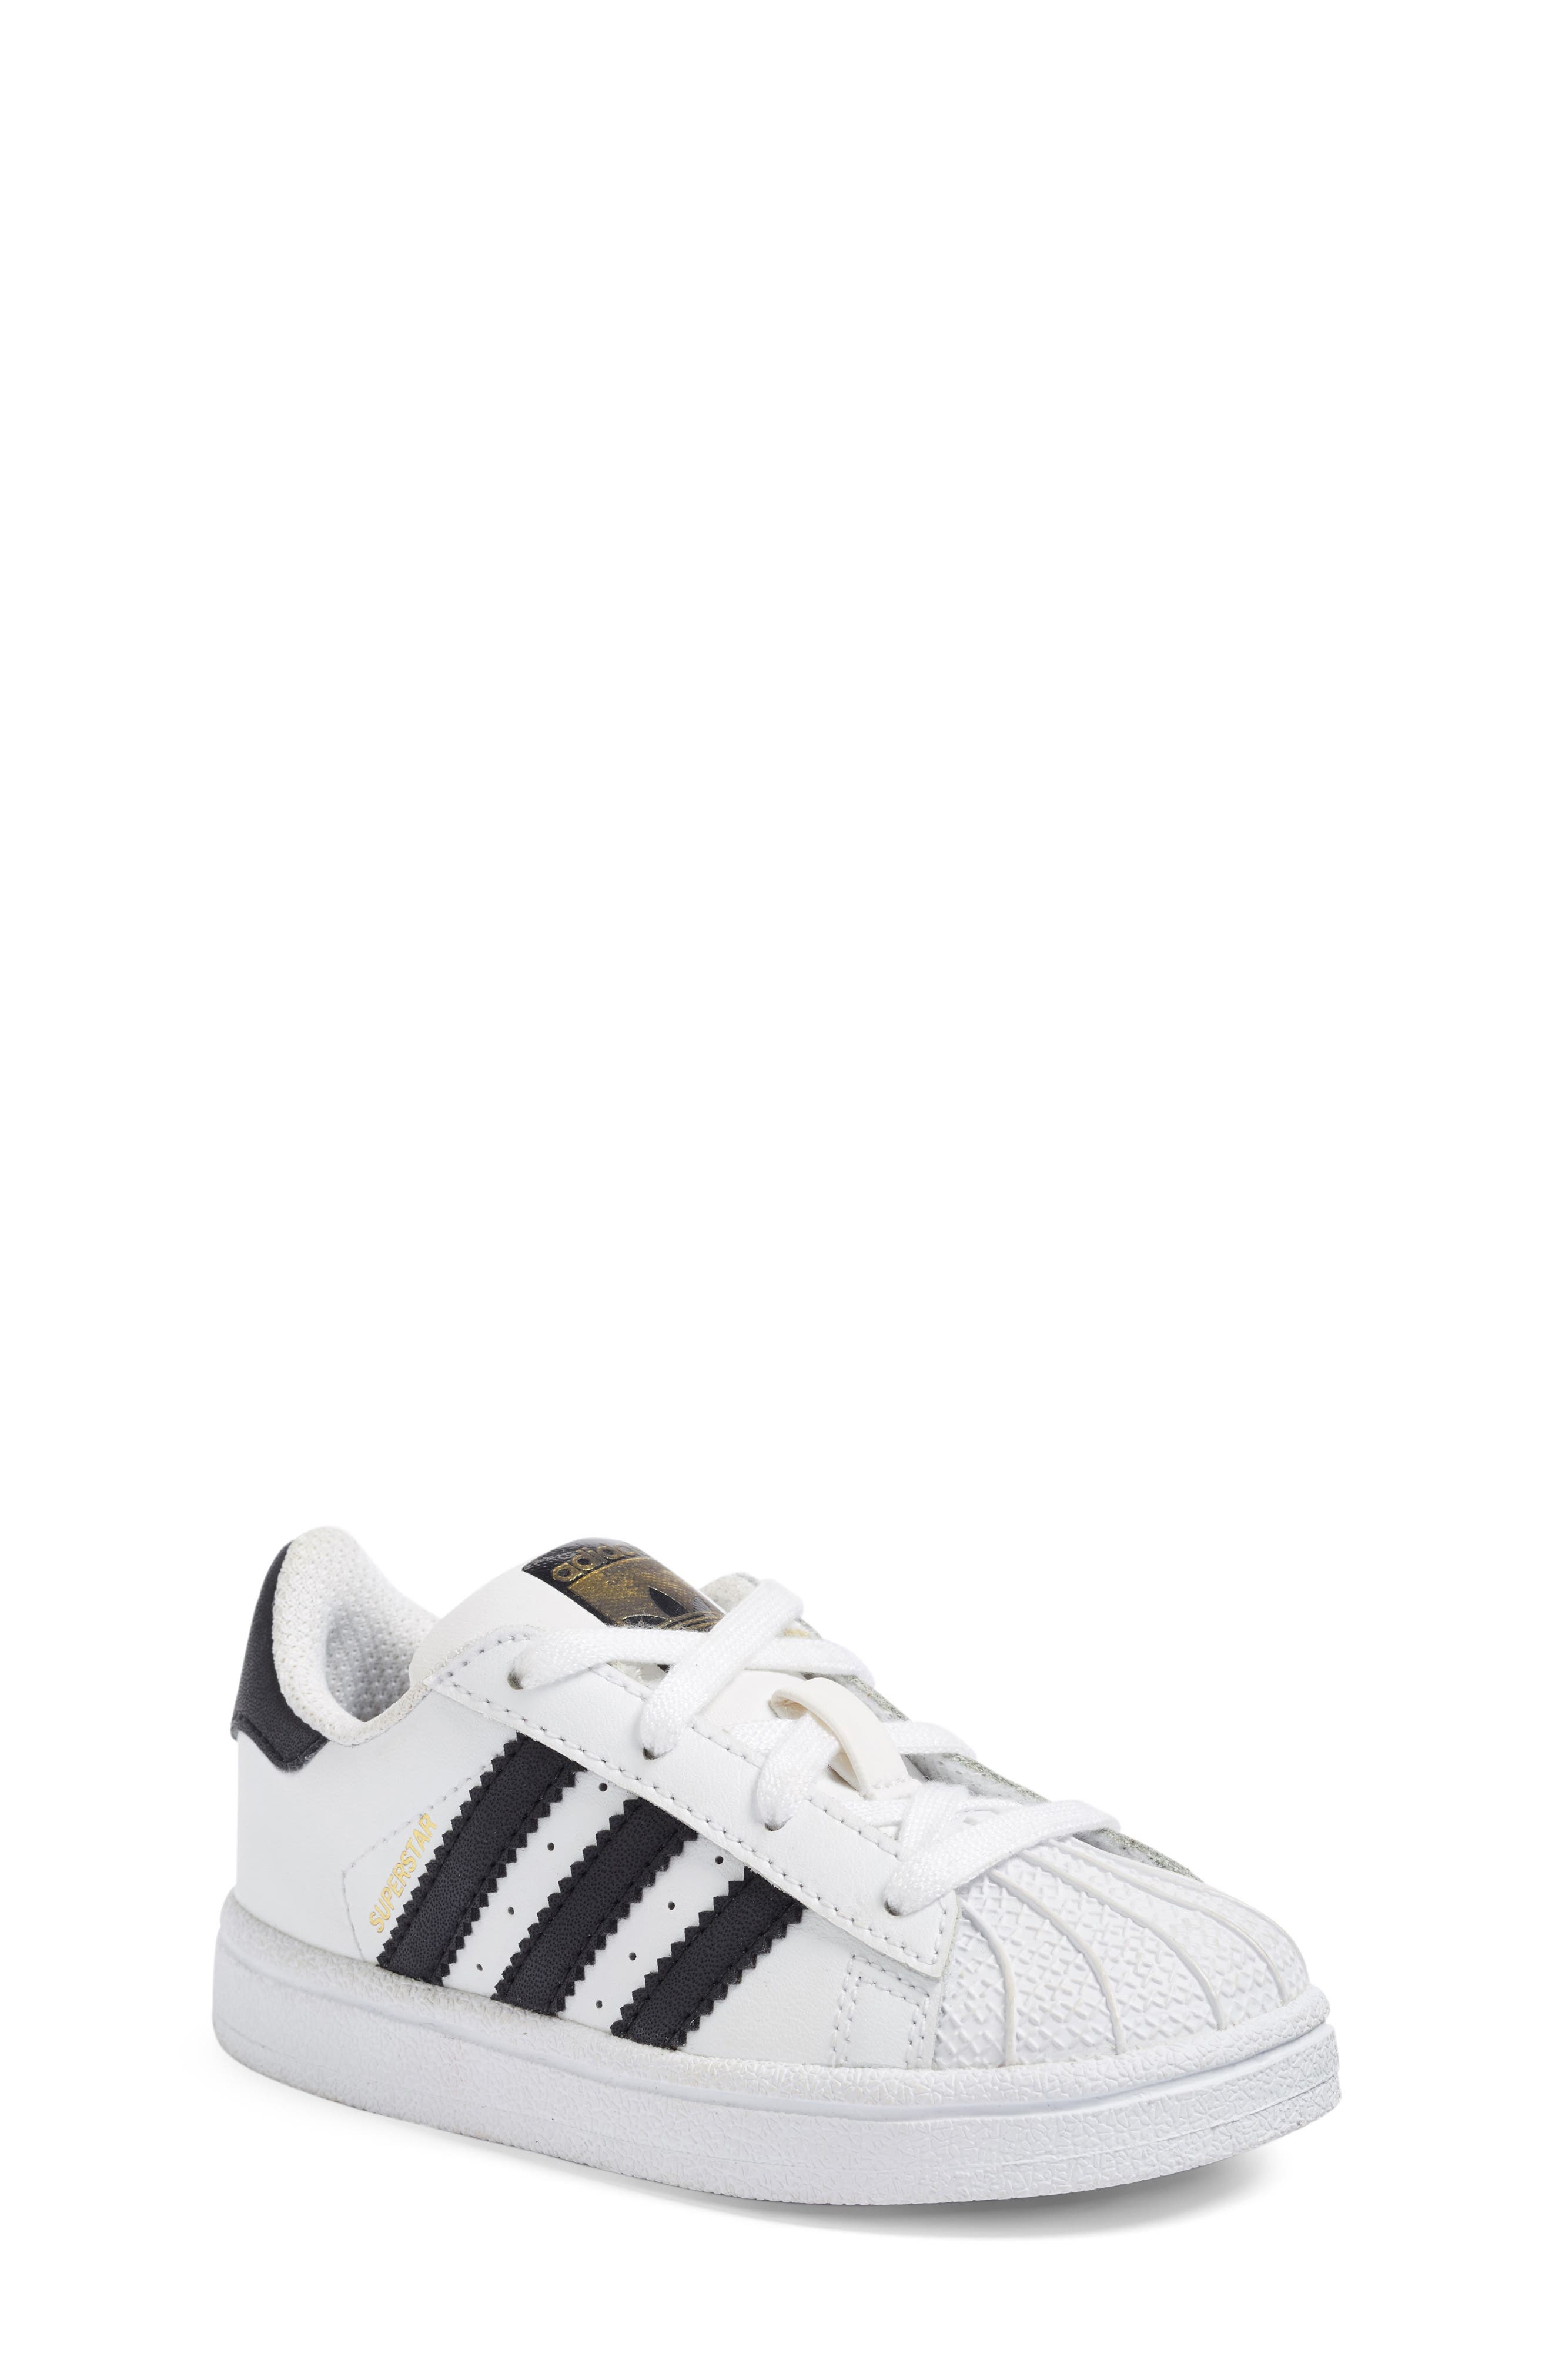 Superstar Foundation Sneaker,                             Main thumbnail 1, color,                             100